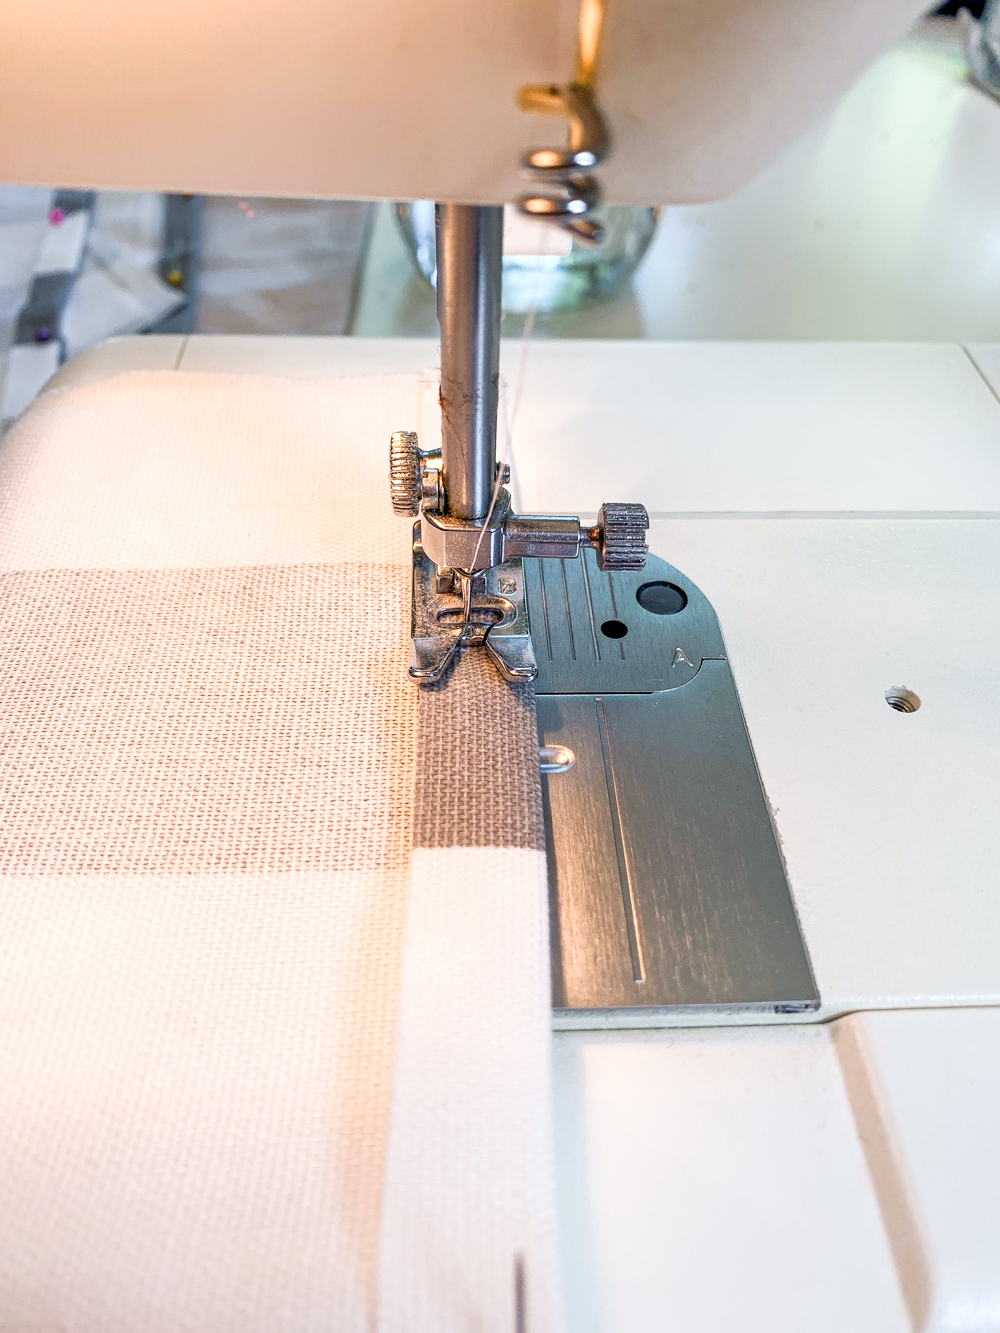 sewing machine sewing 1/2